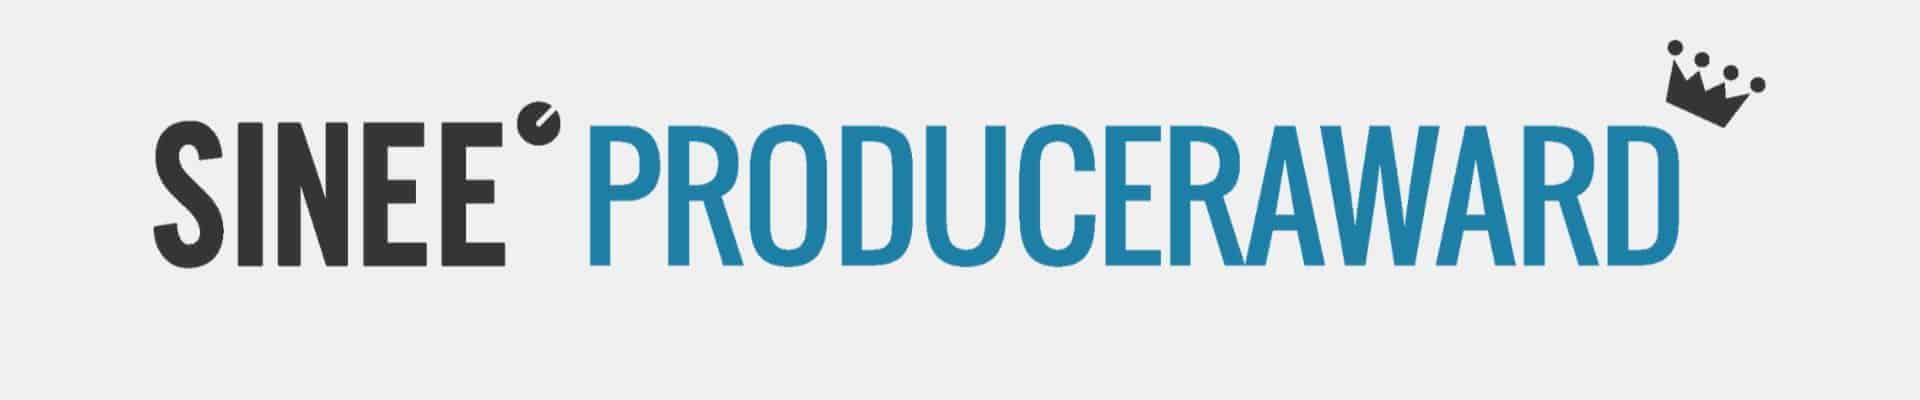 Sinee Producer Award 1